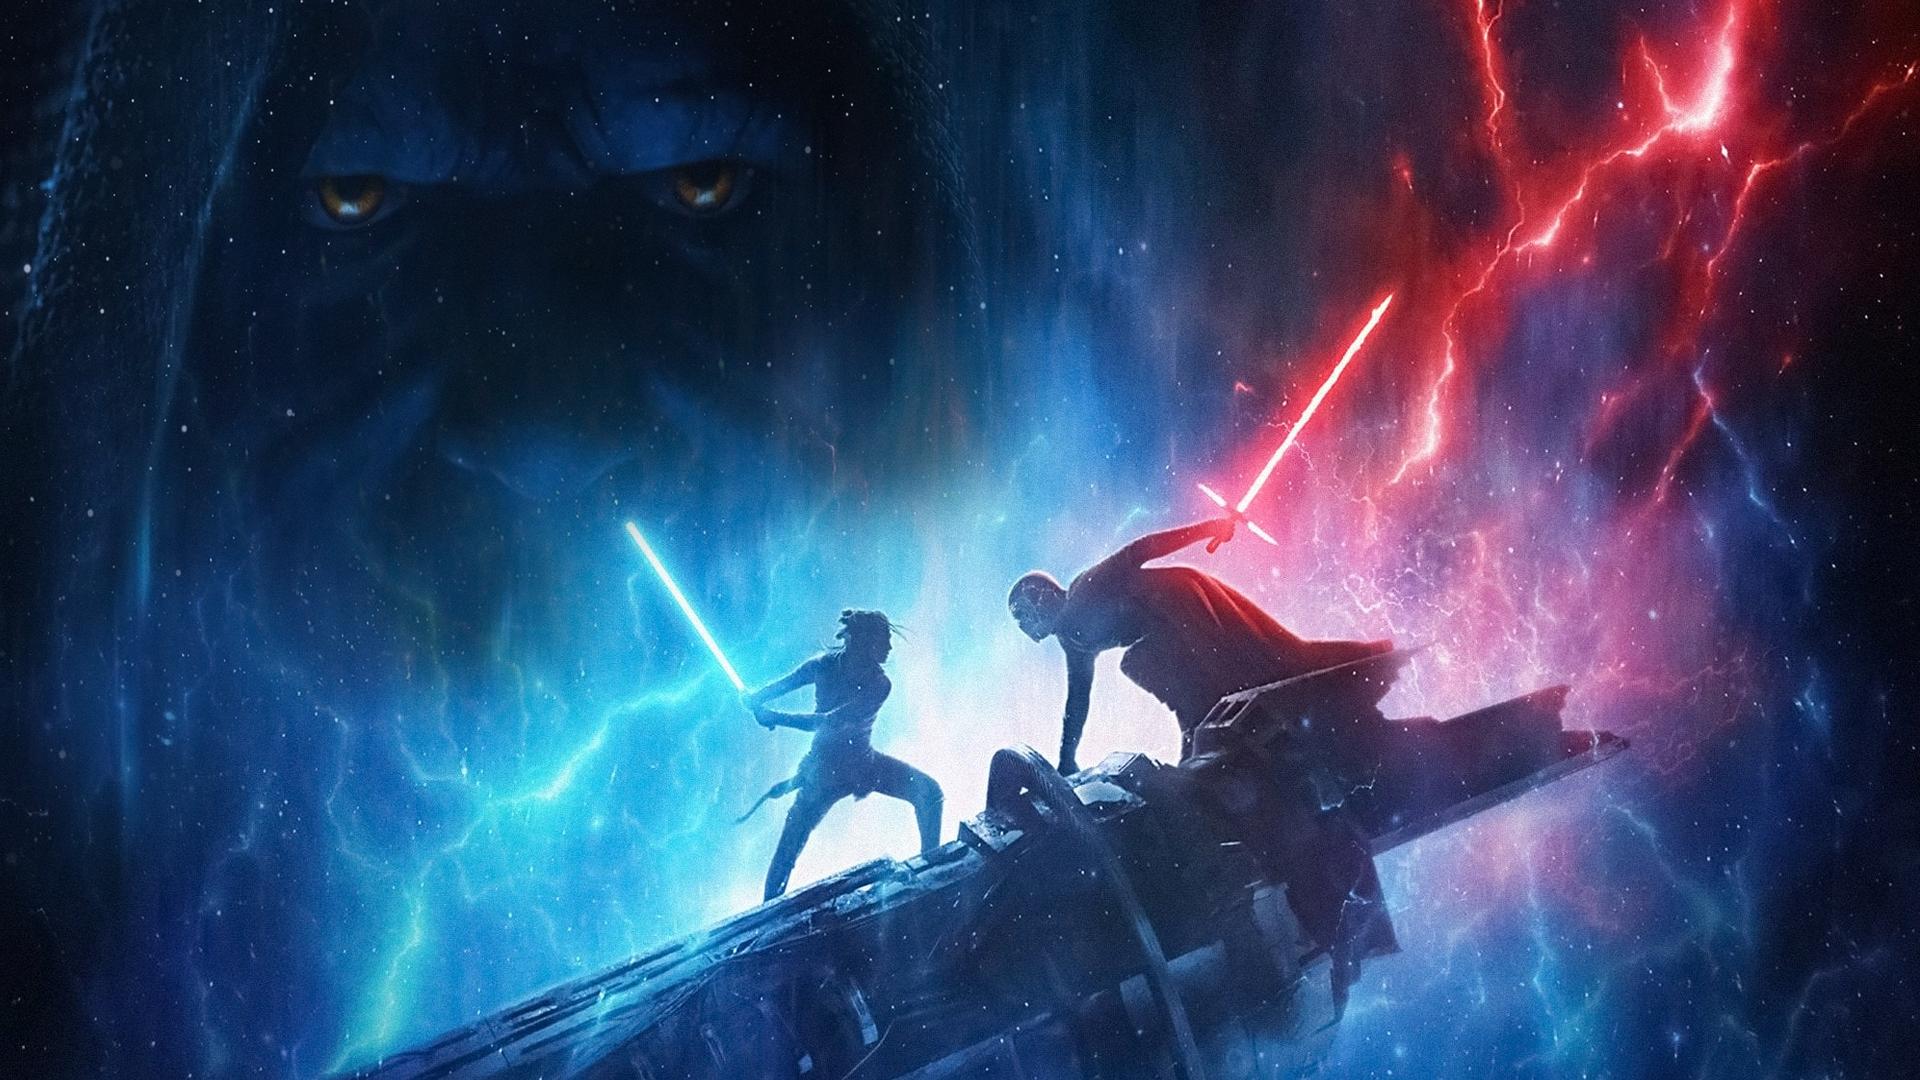 The Rise Of Skywalker Wallpaper Teaser By Spirit Of Adventure On Deviantart